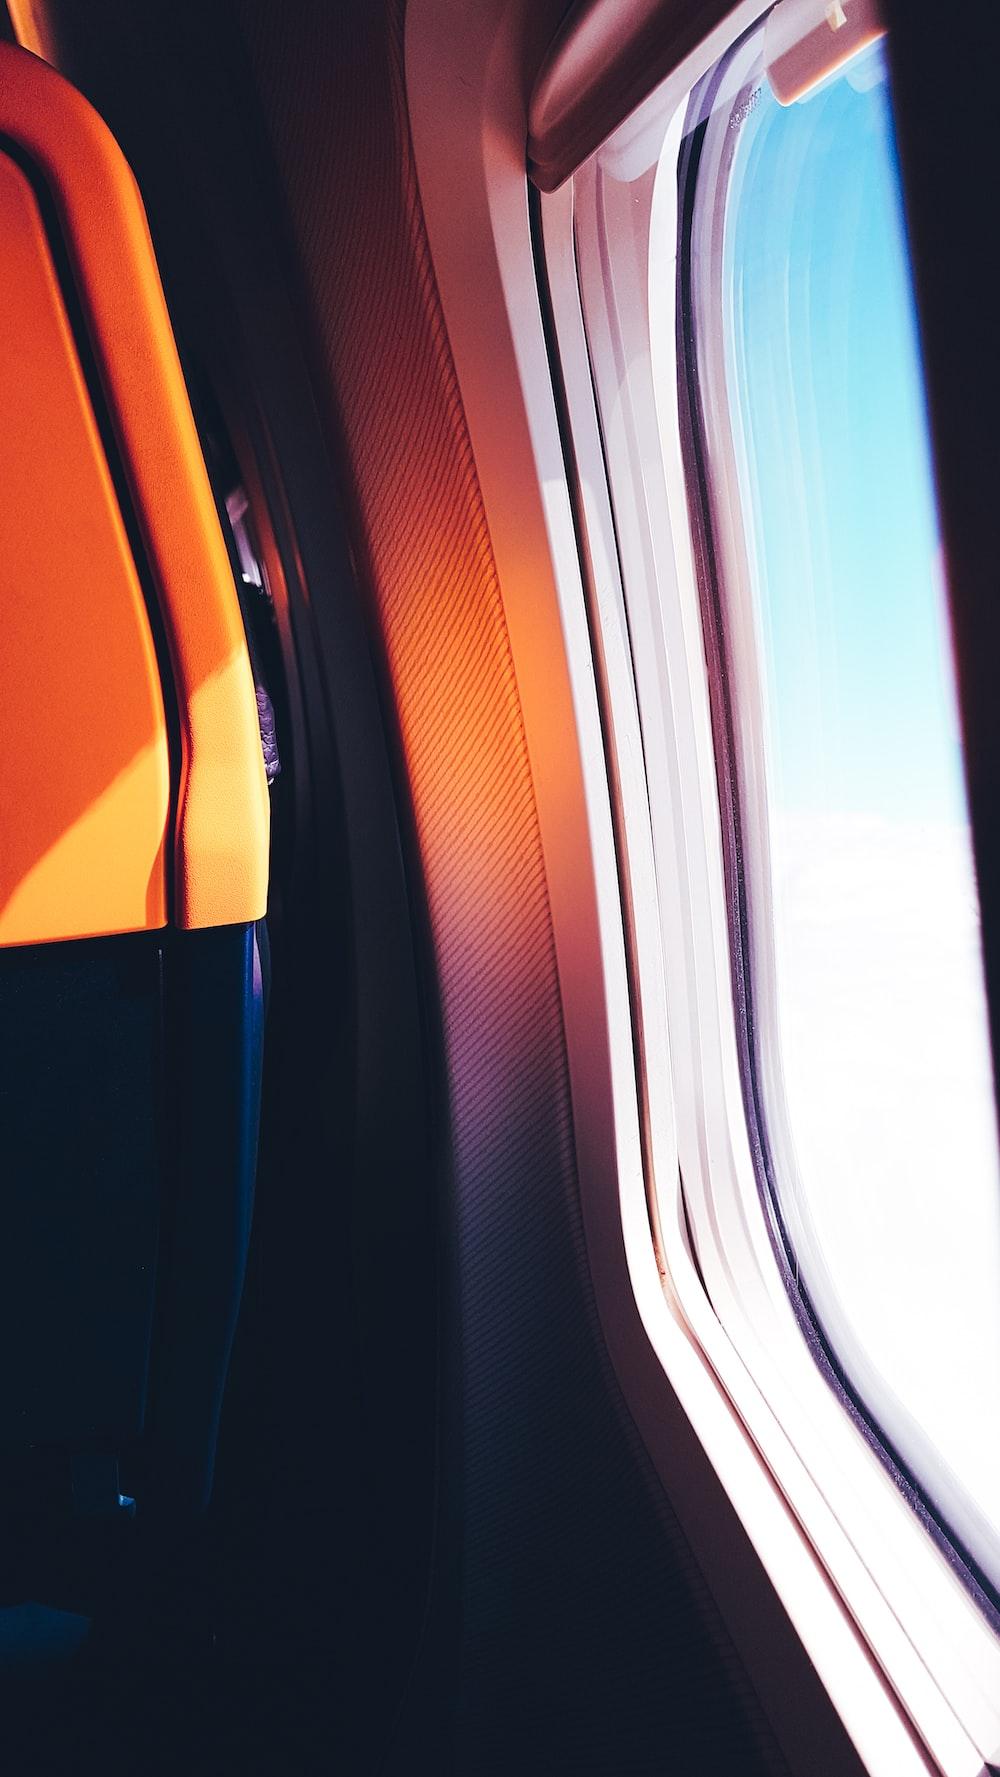 black and orange airplane window